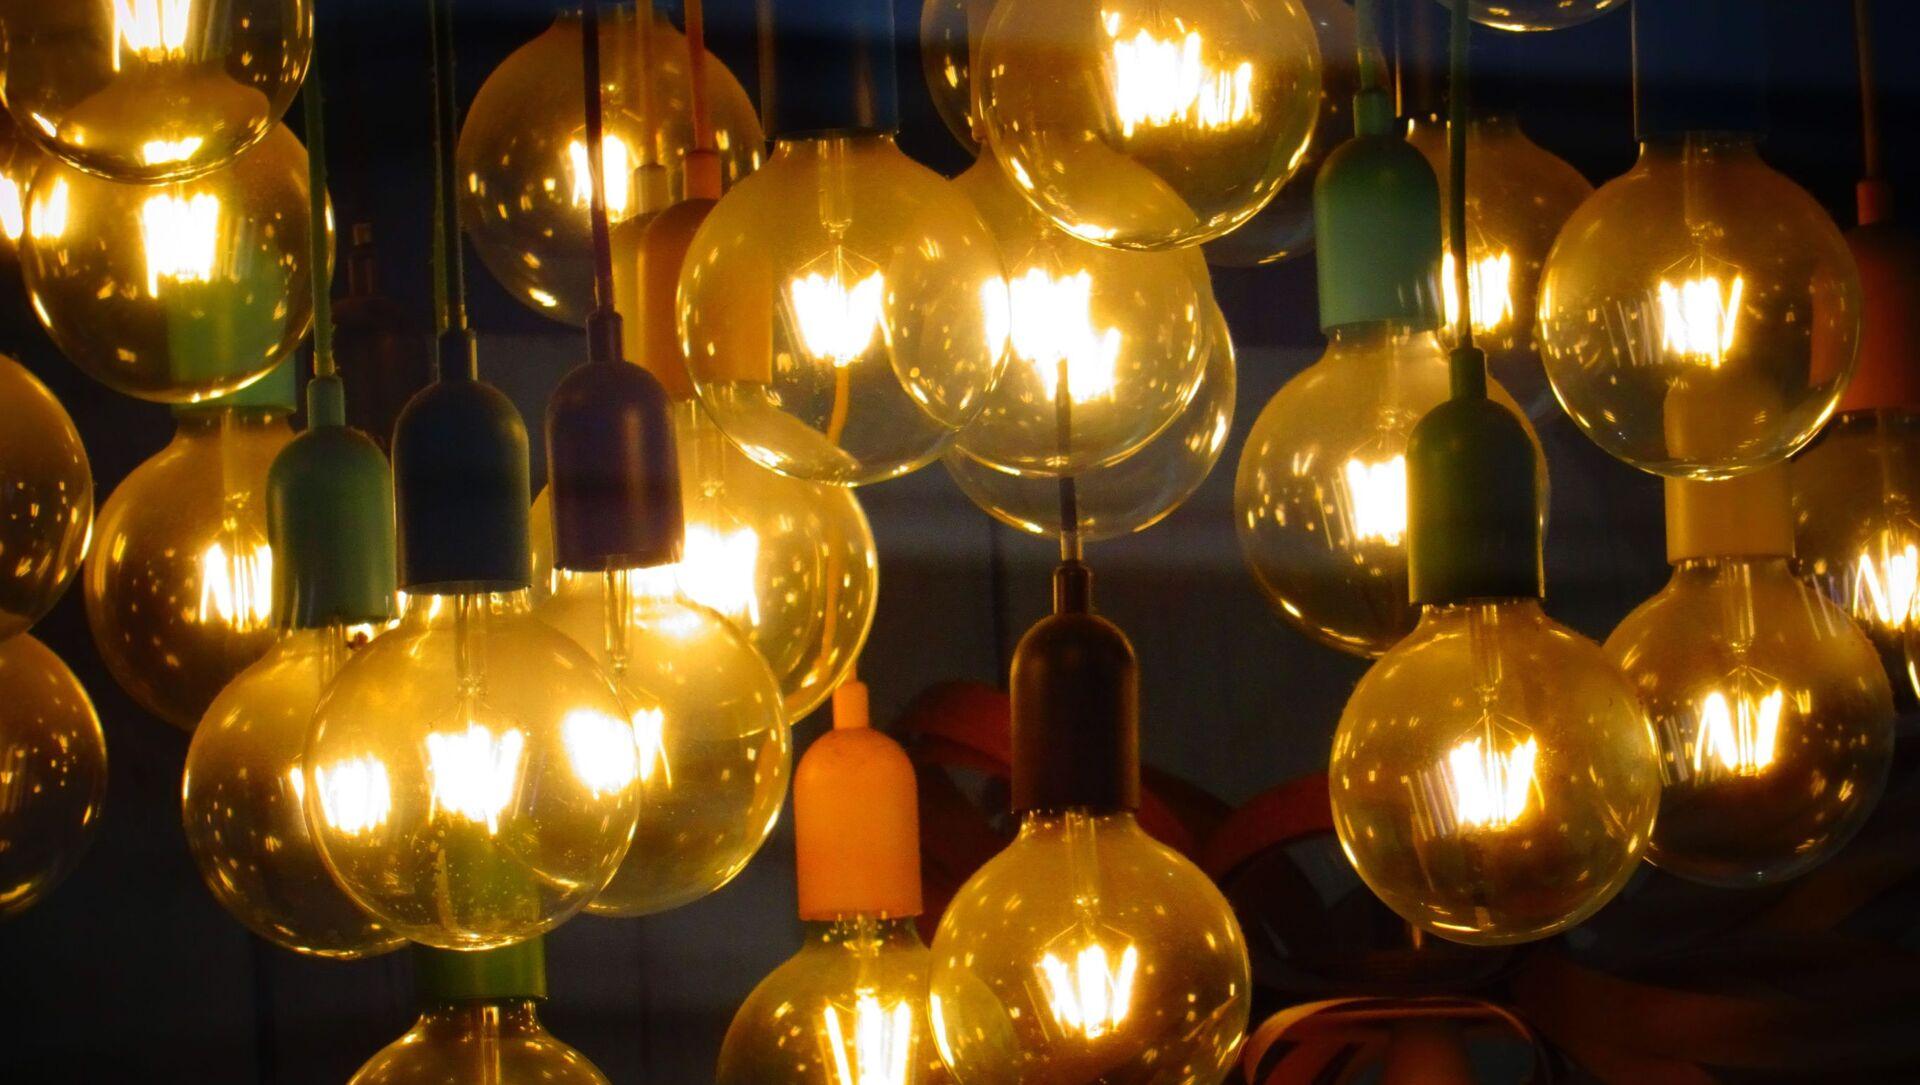 Лампочки  - Sputnik Абхазия, 1920, 22.09.2021